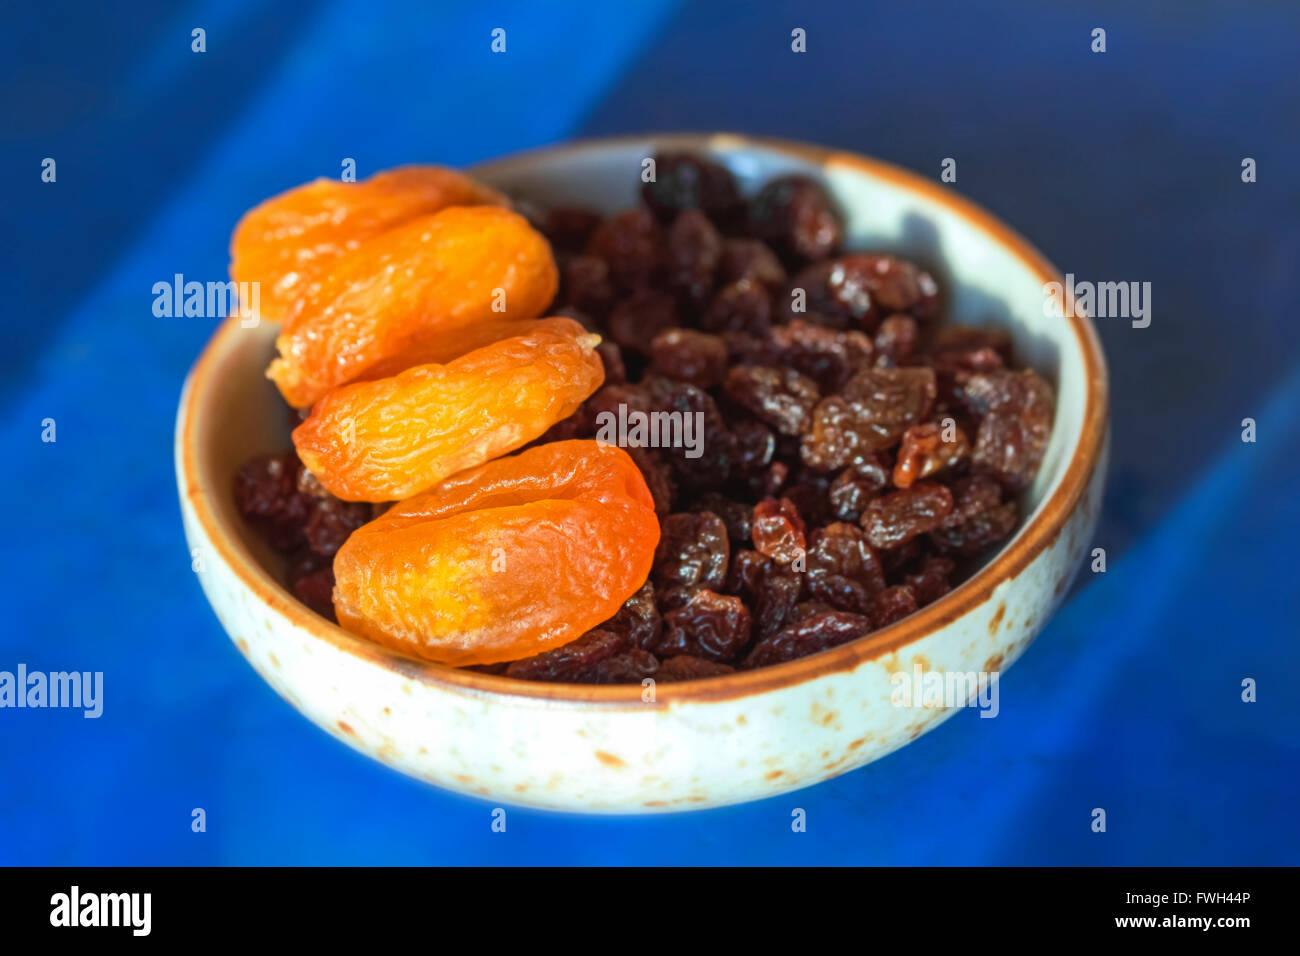 Abricots secs et raisins secs dans peu de plaque sur fond bleu Banque D'Images